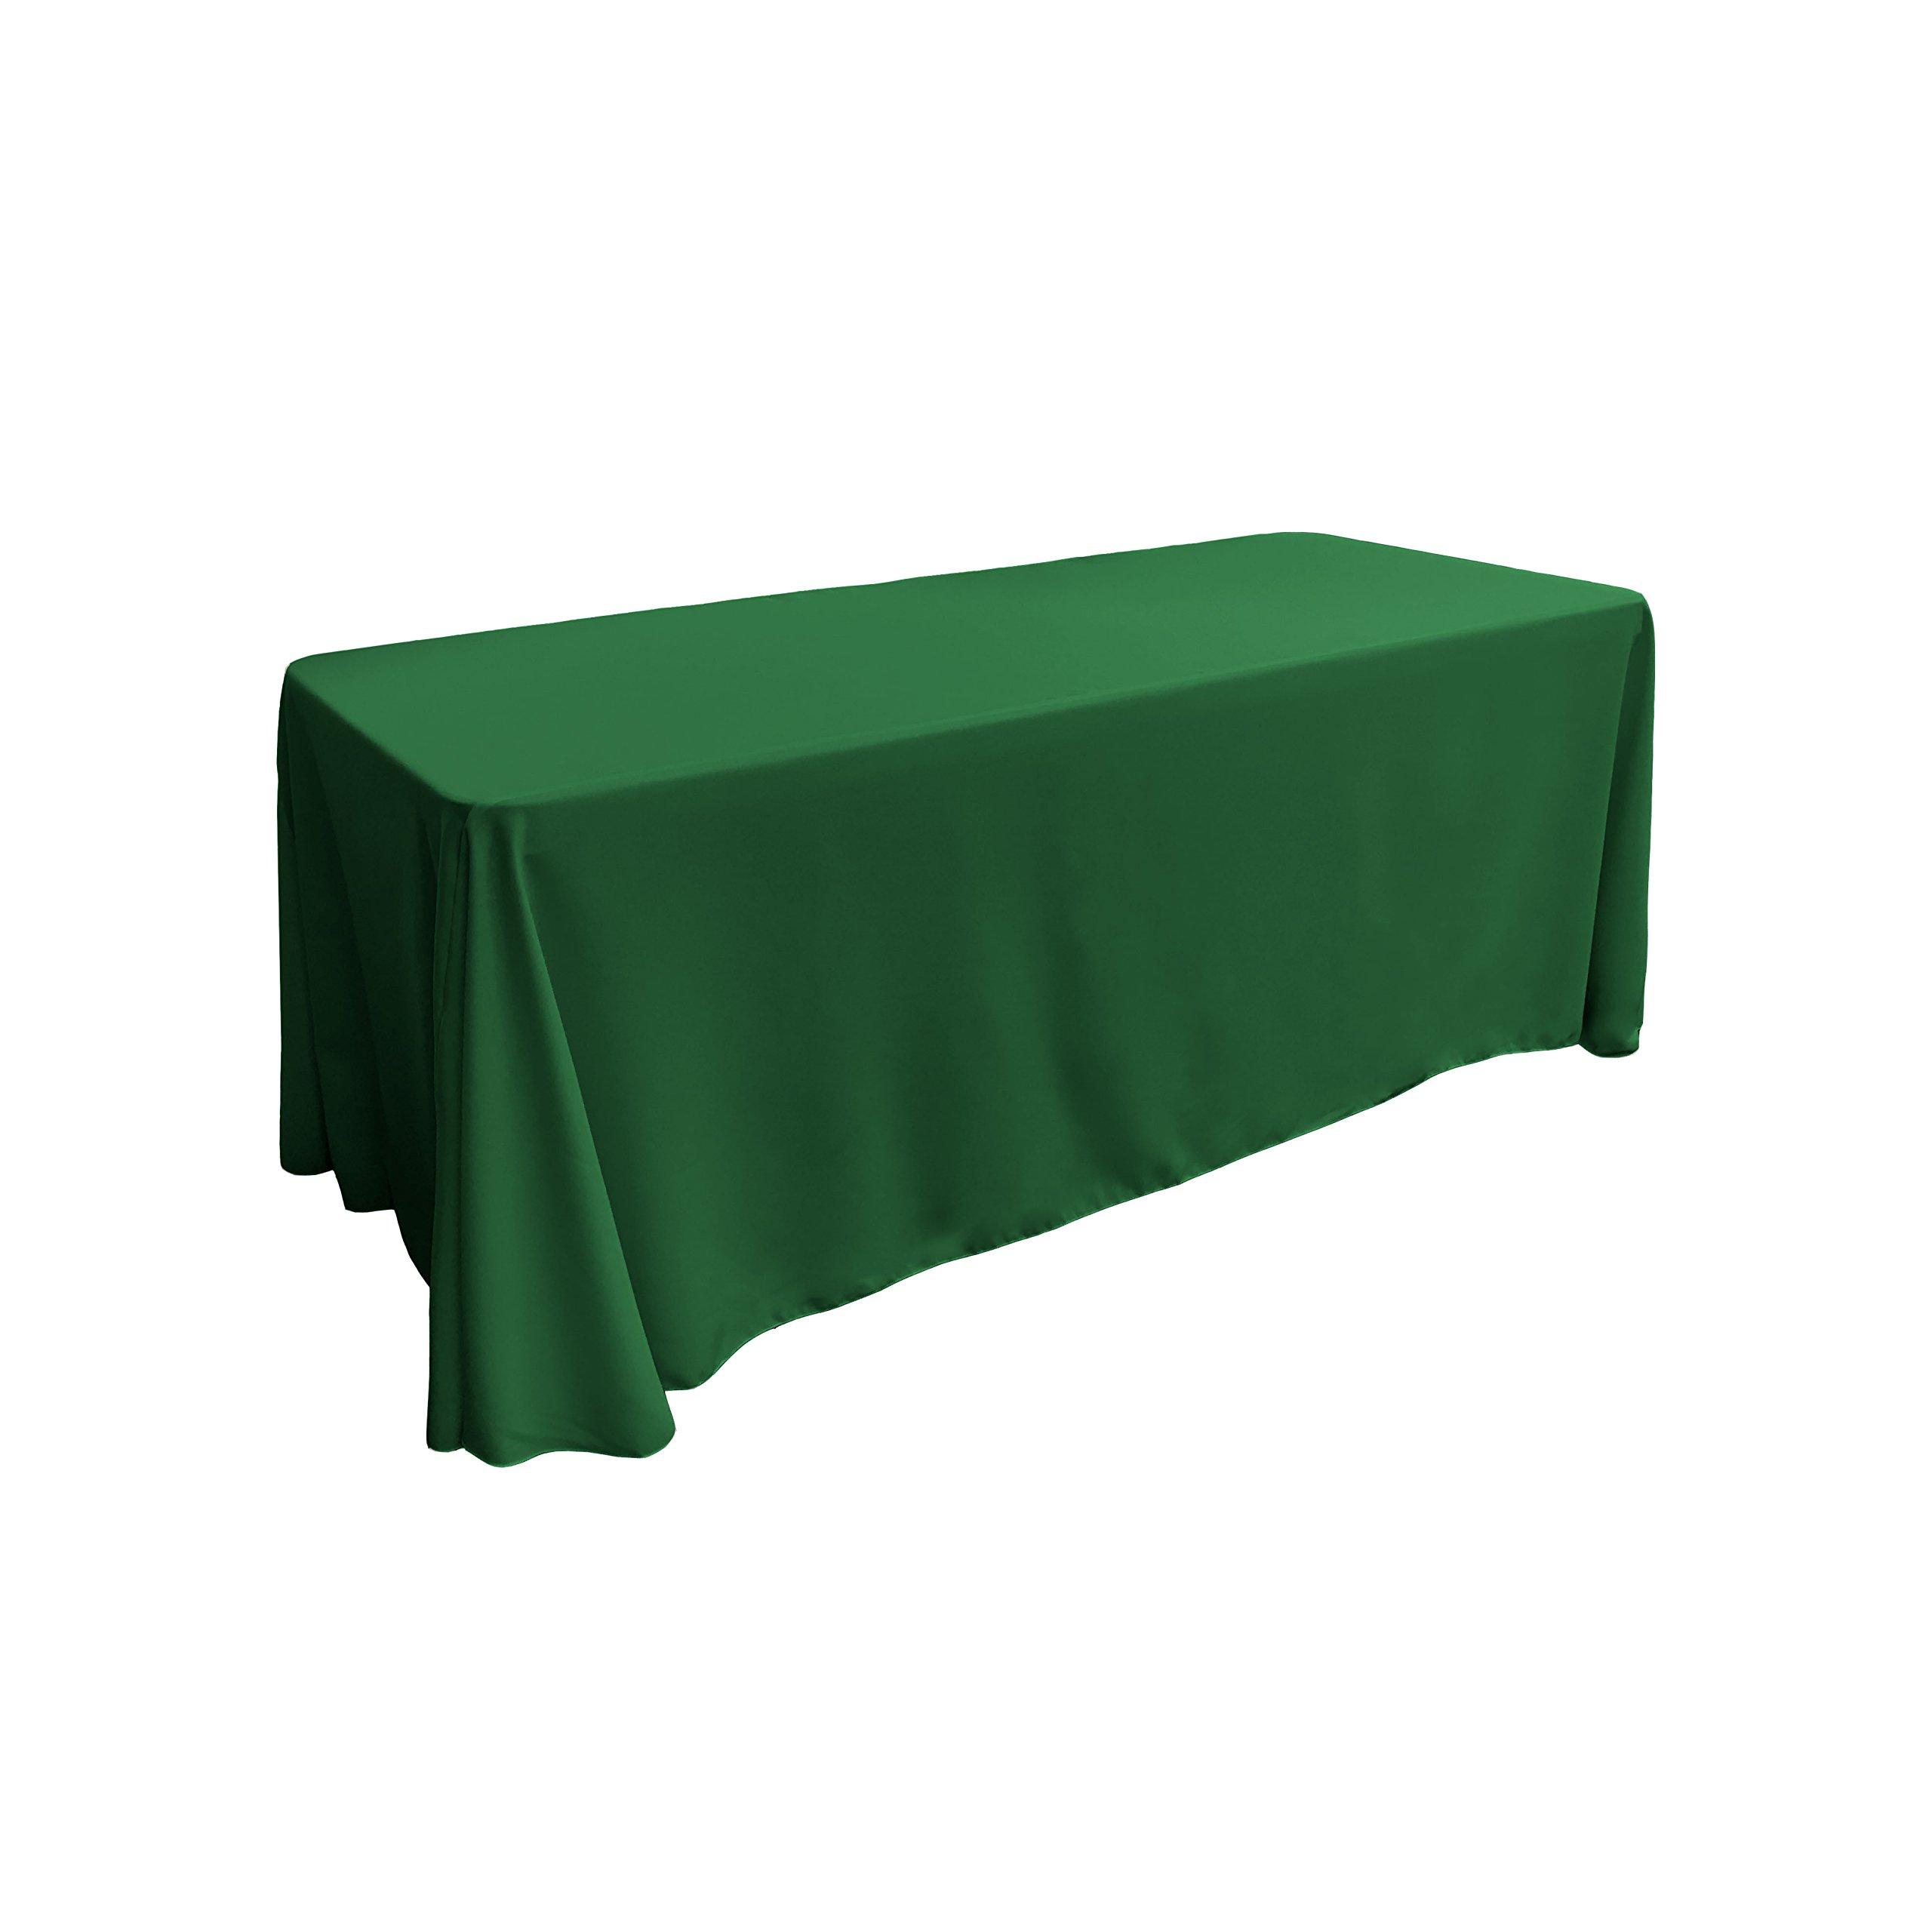 LA Linen Polyester Poplin Rectangular Tablecloth, 90 by 156-Inch, Green Emerald